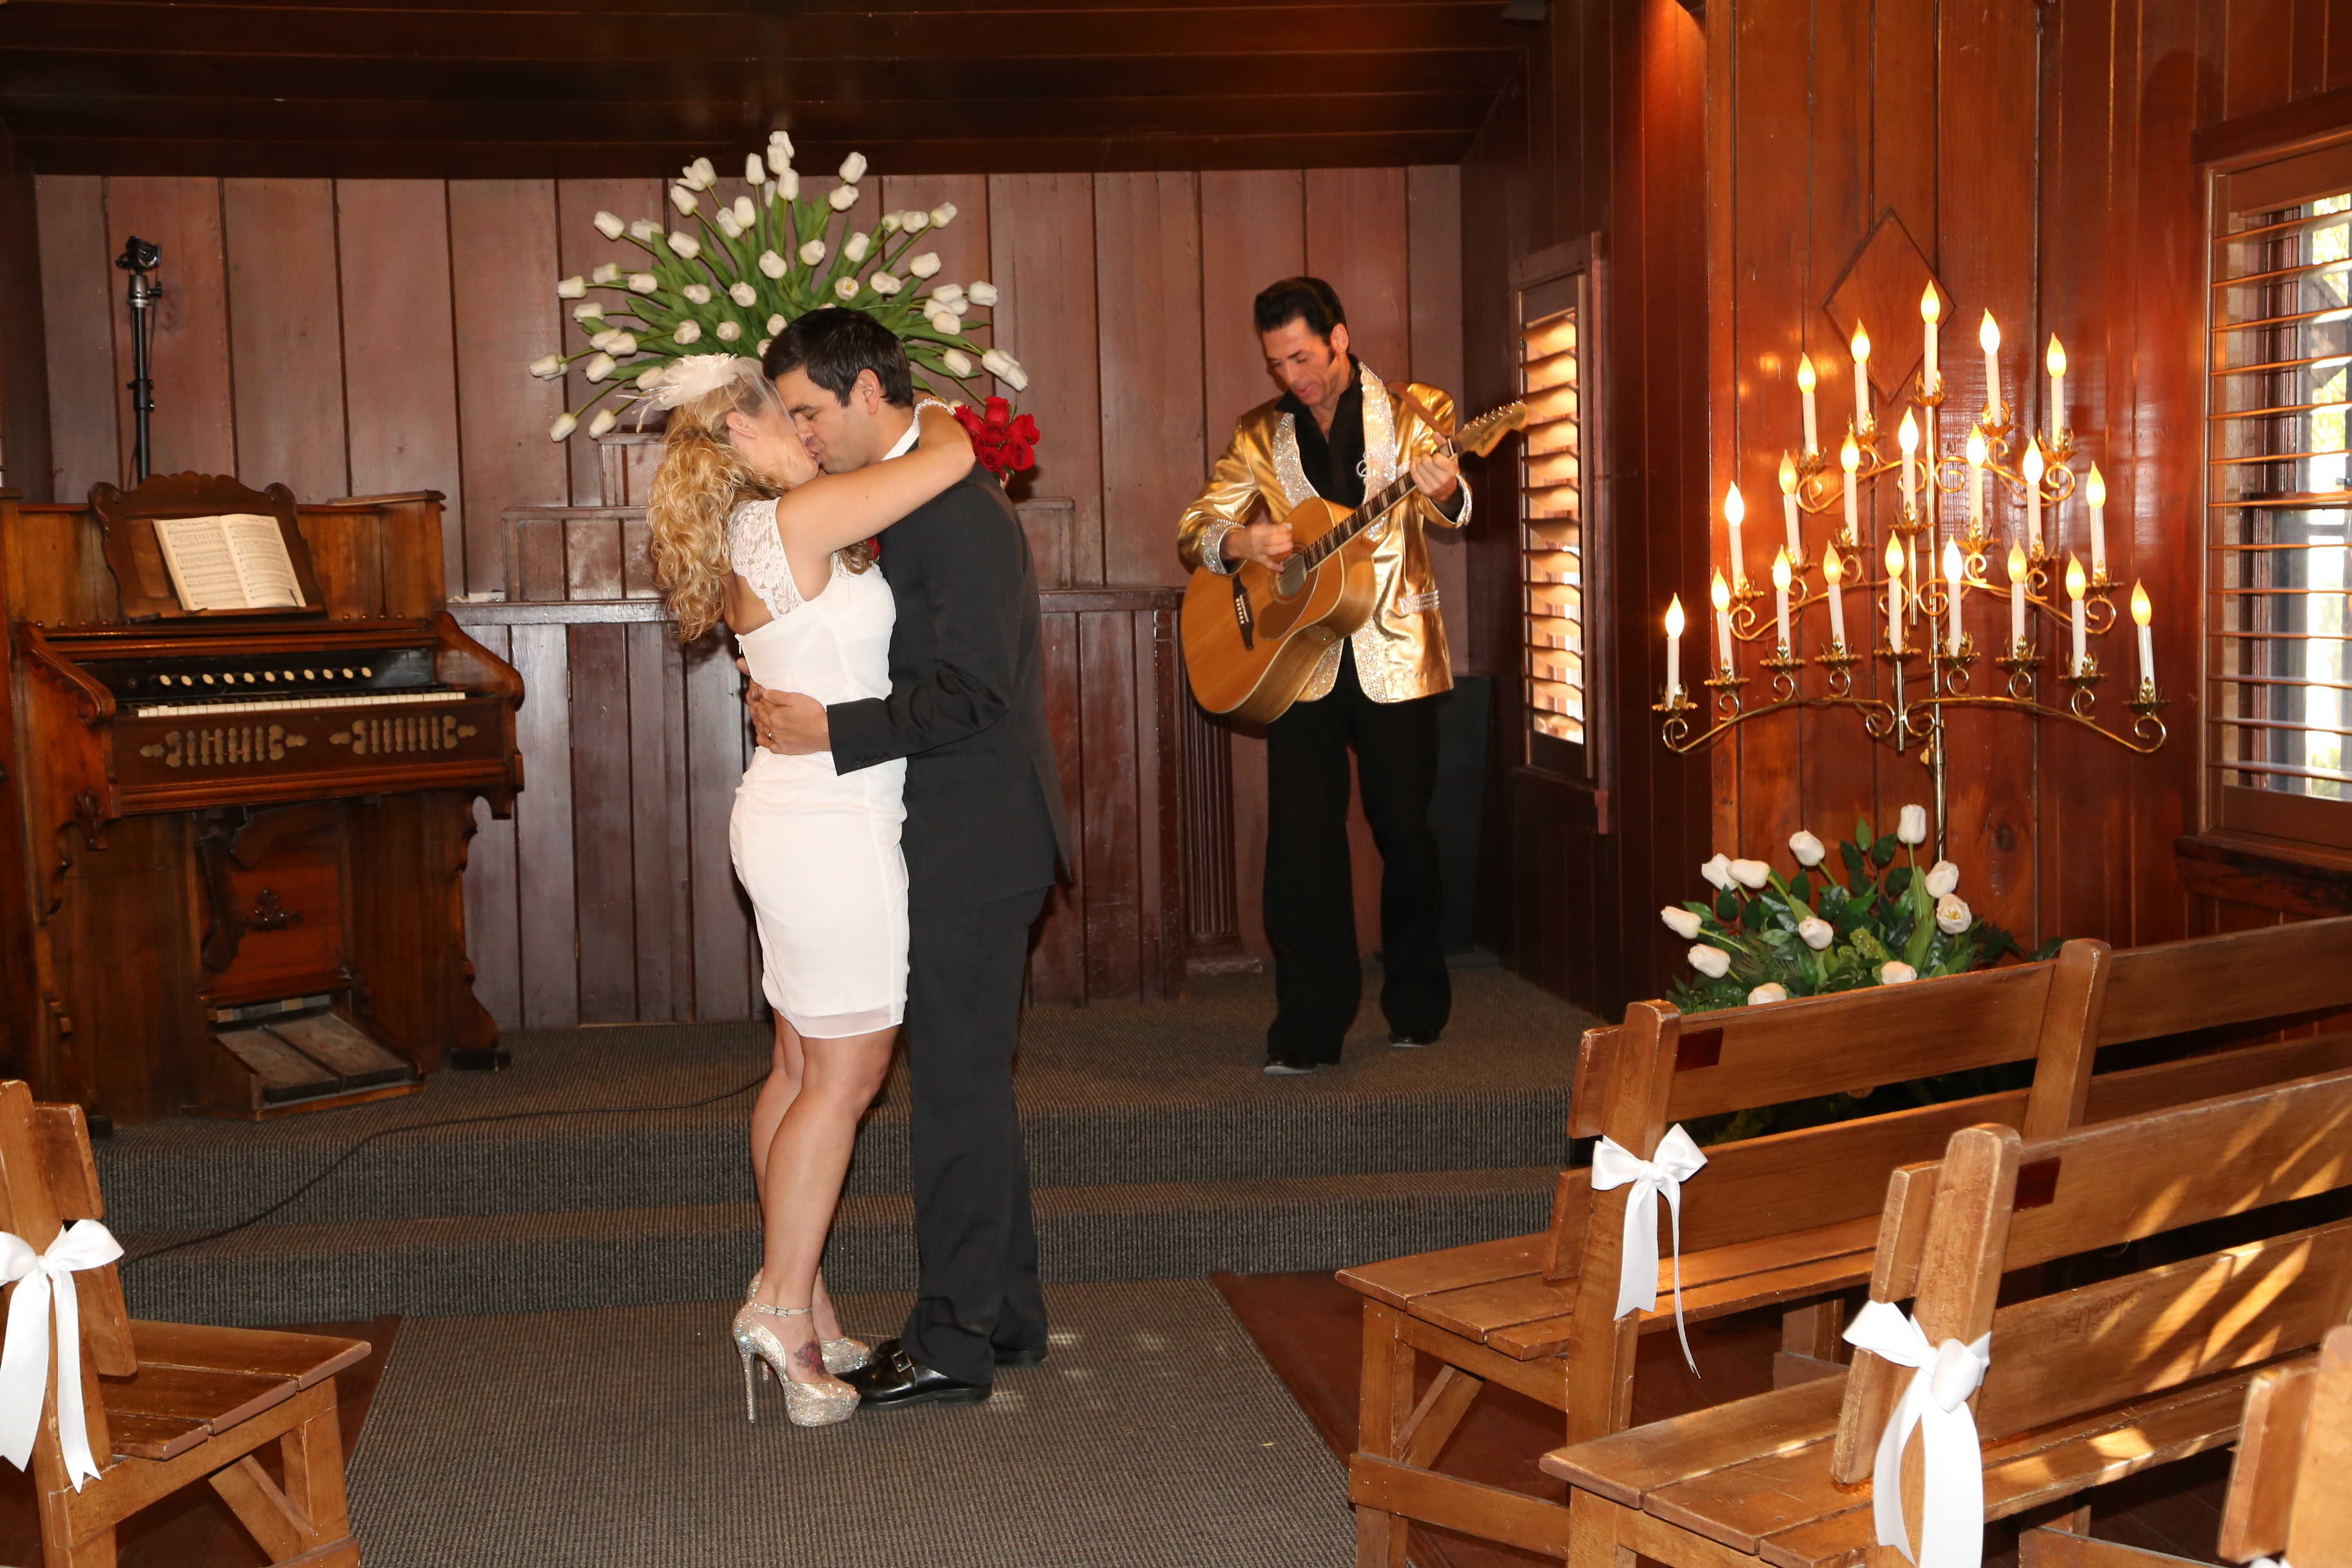 las vegas wedding chapel vegas wedding chapels las vegas wedding chapel